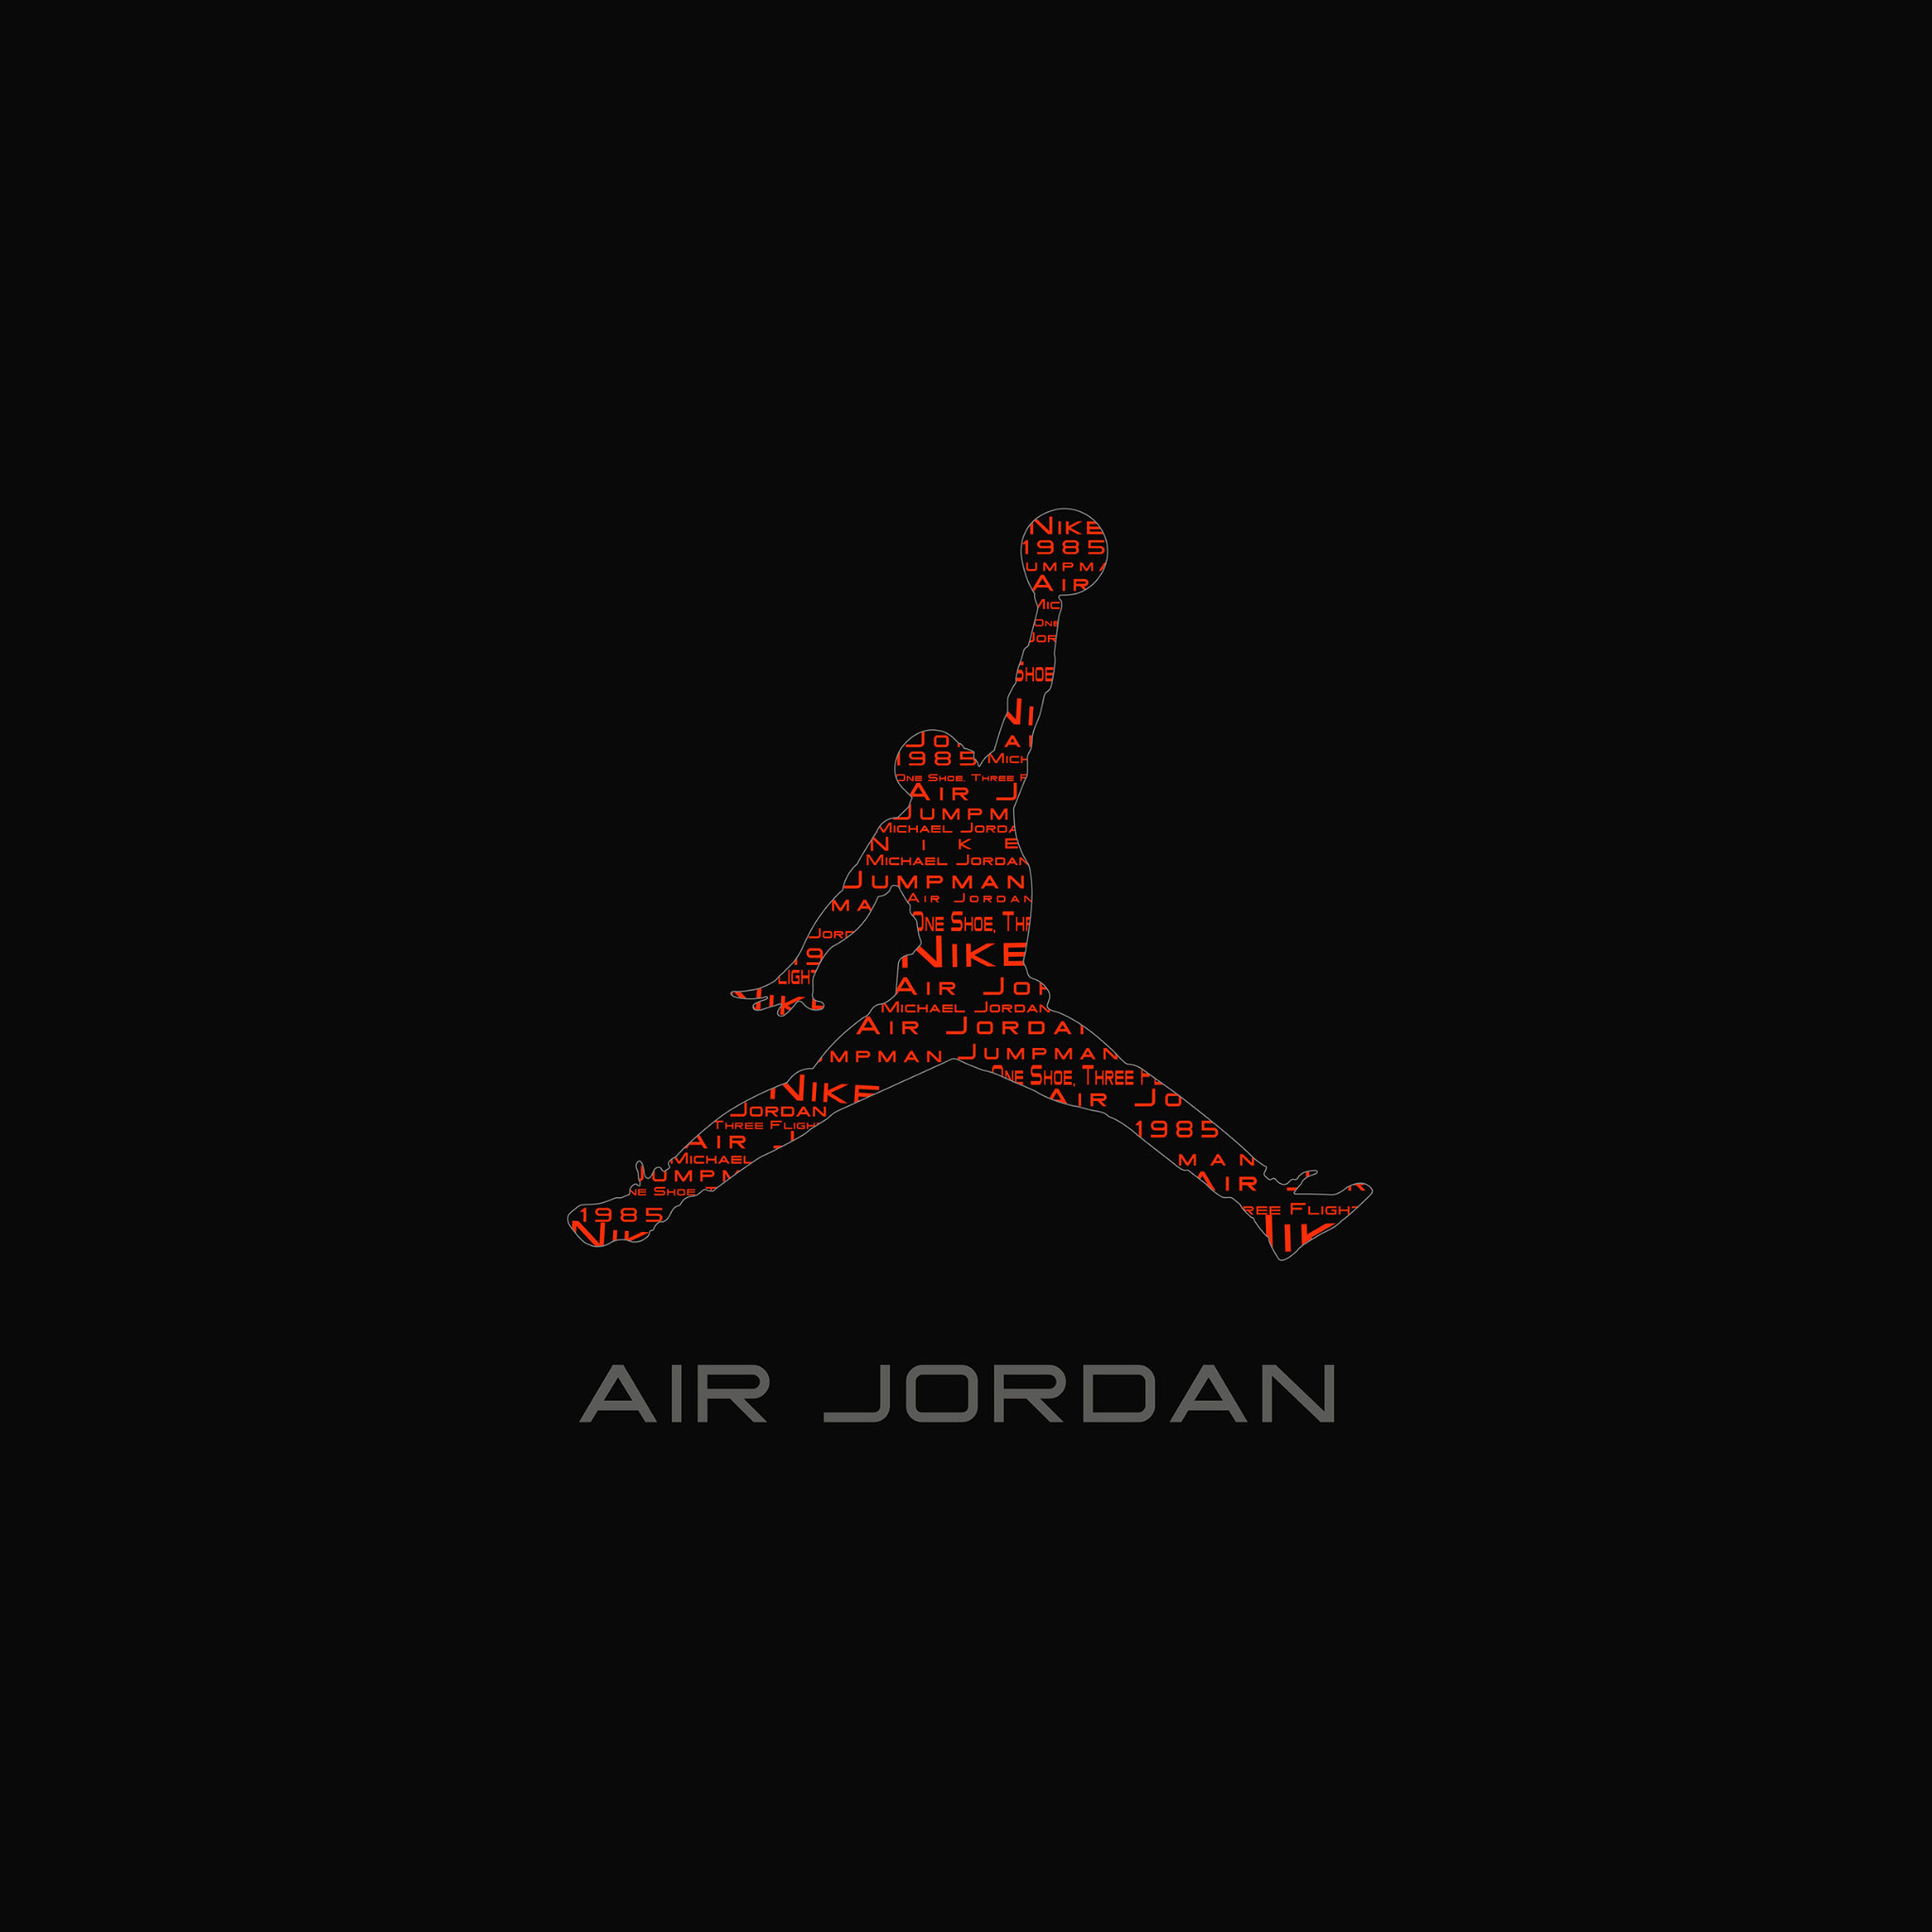 Jordan iPhone Wallpaper HD 74 images 2048x2048